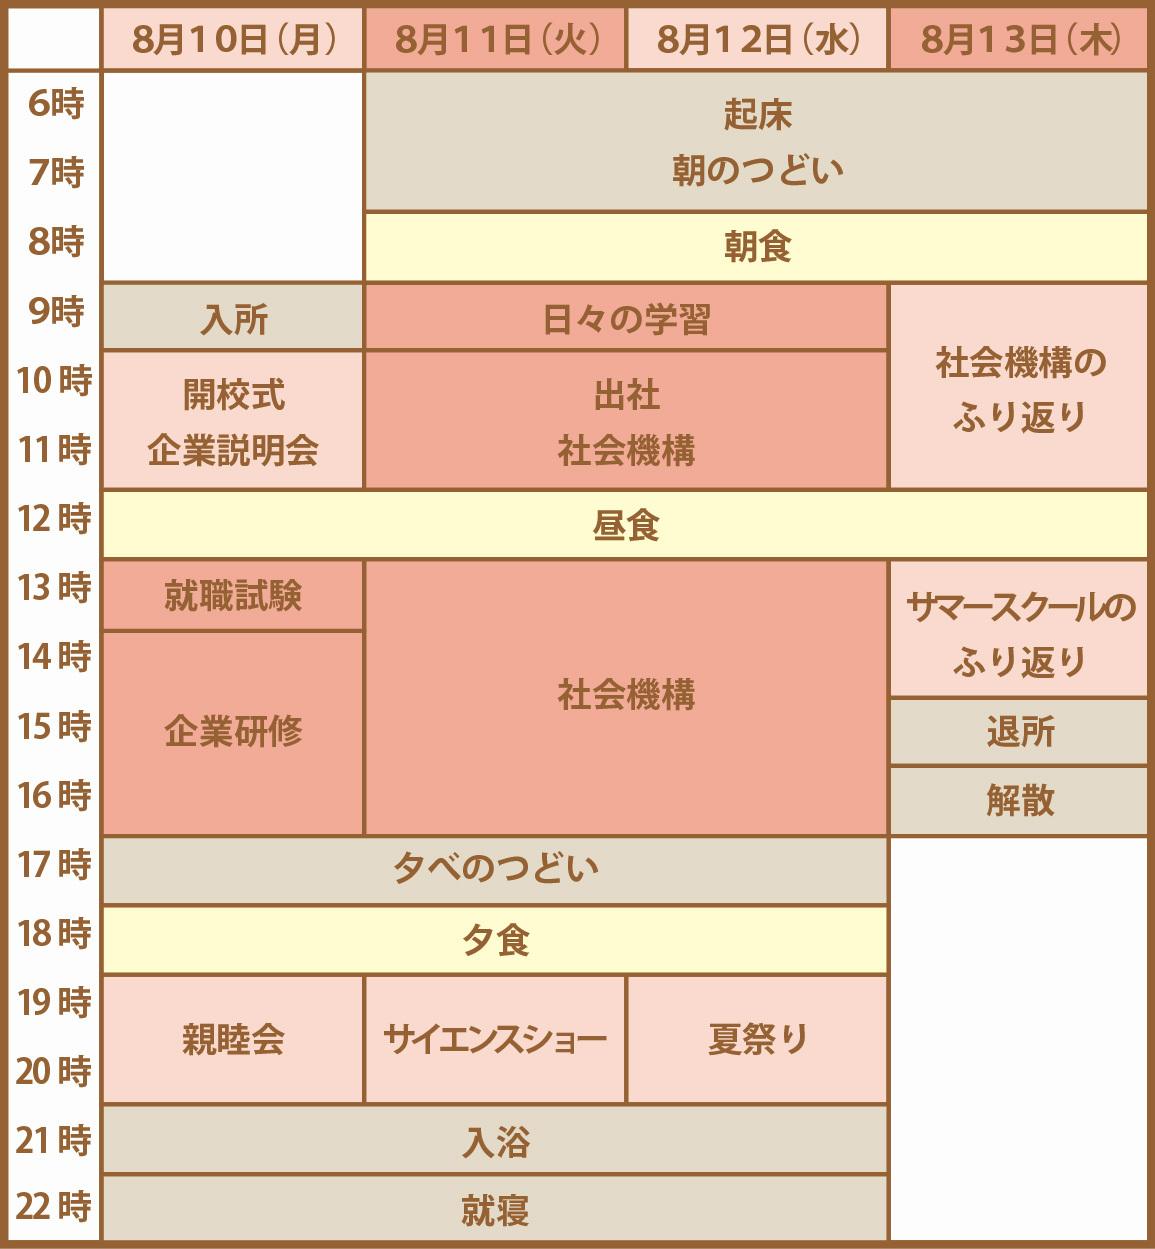 20150930_SSのプログラム-01.jpg